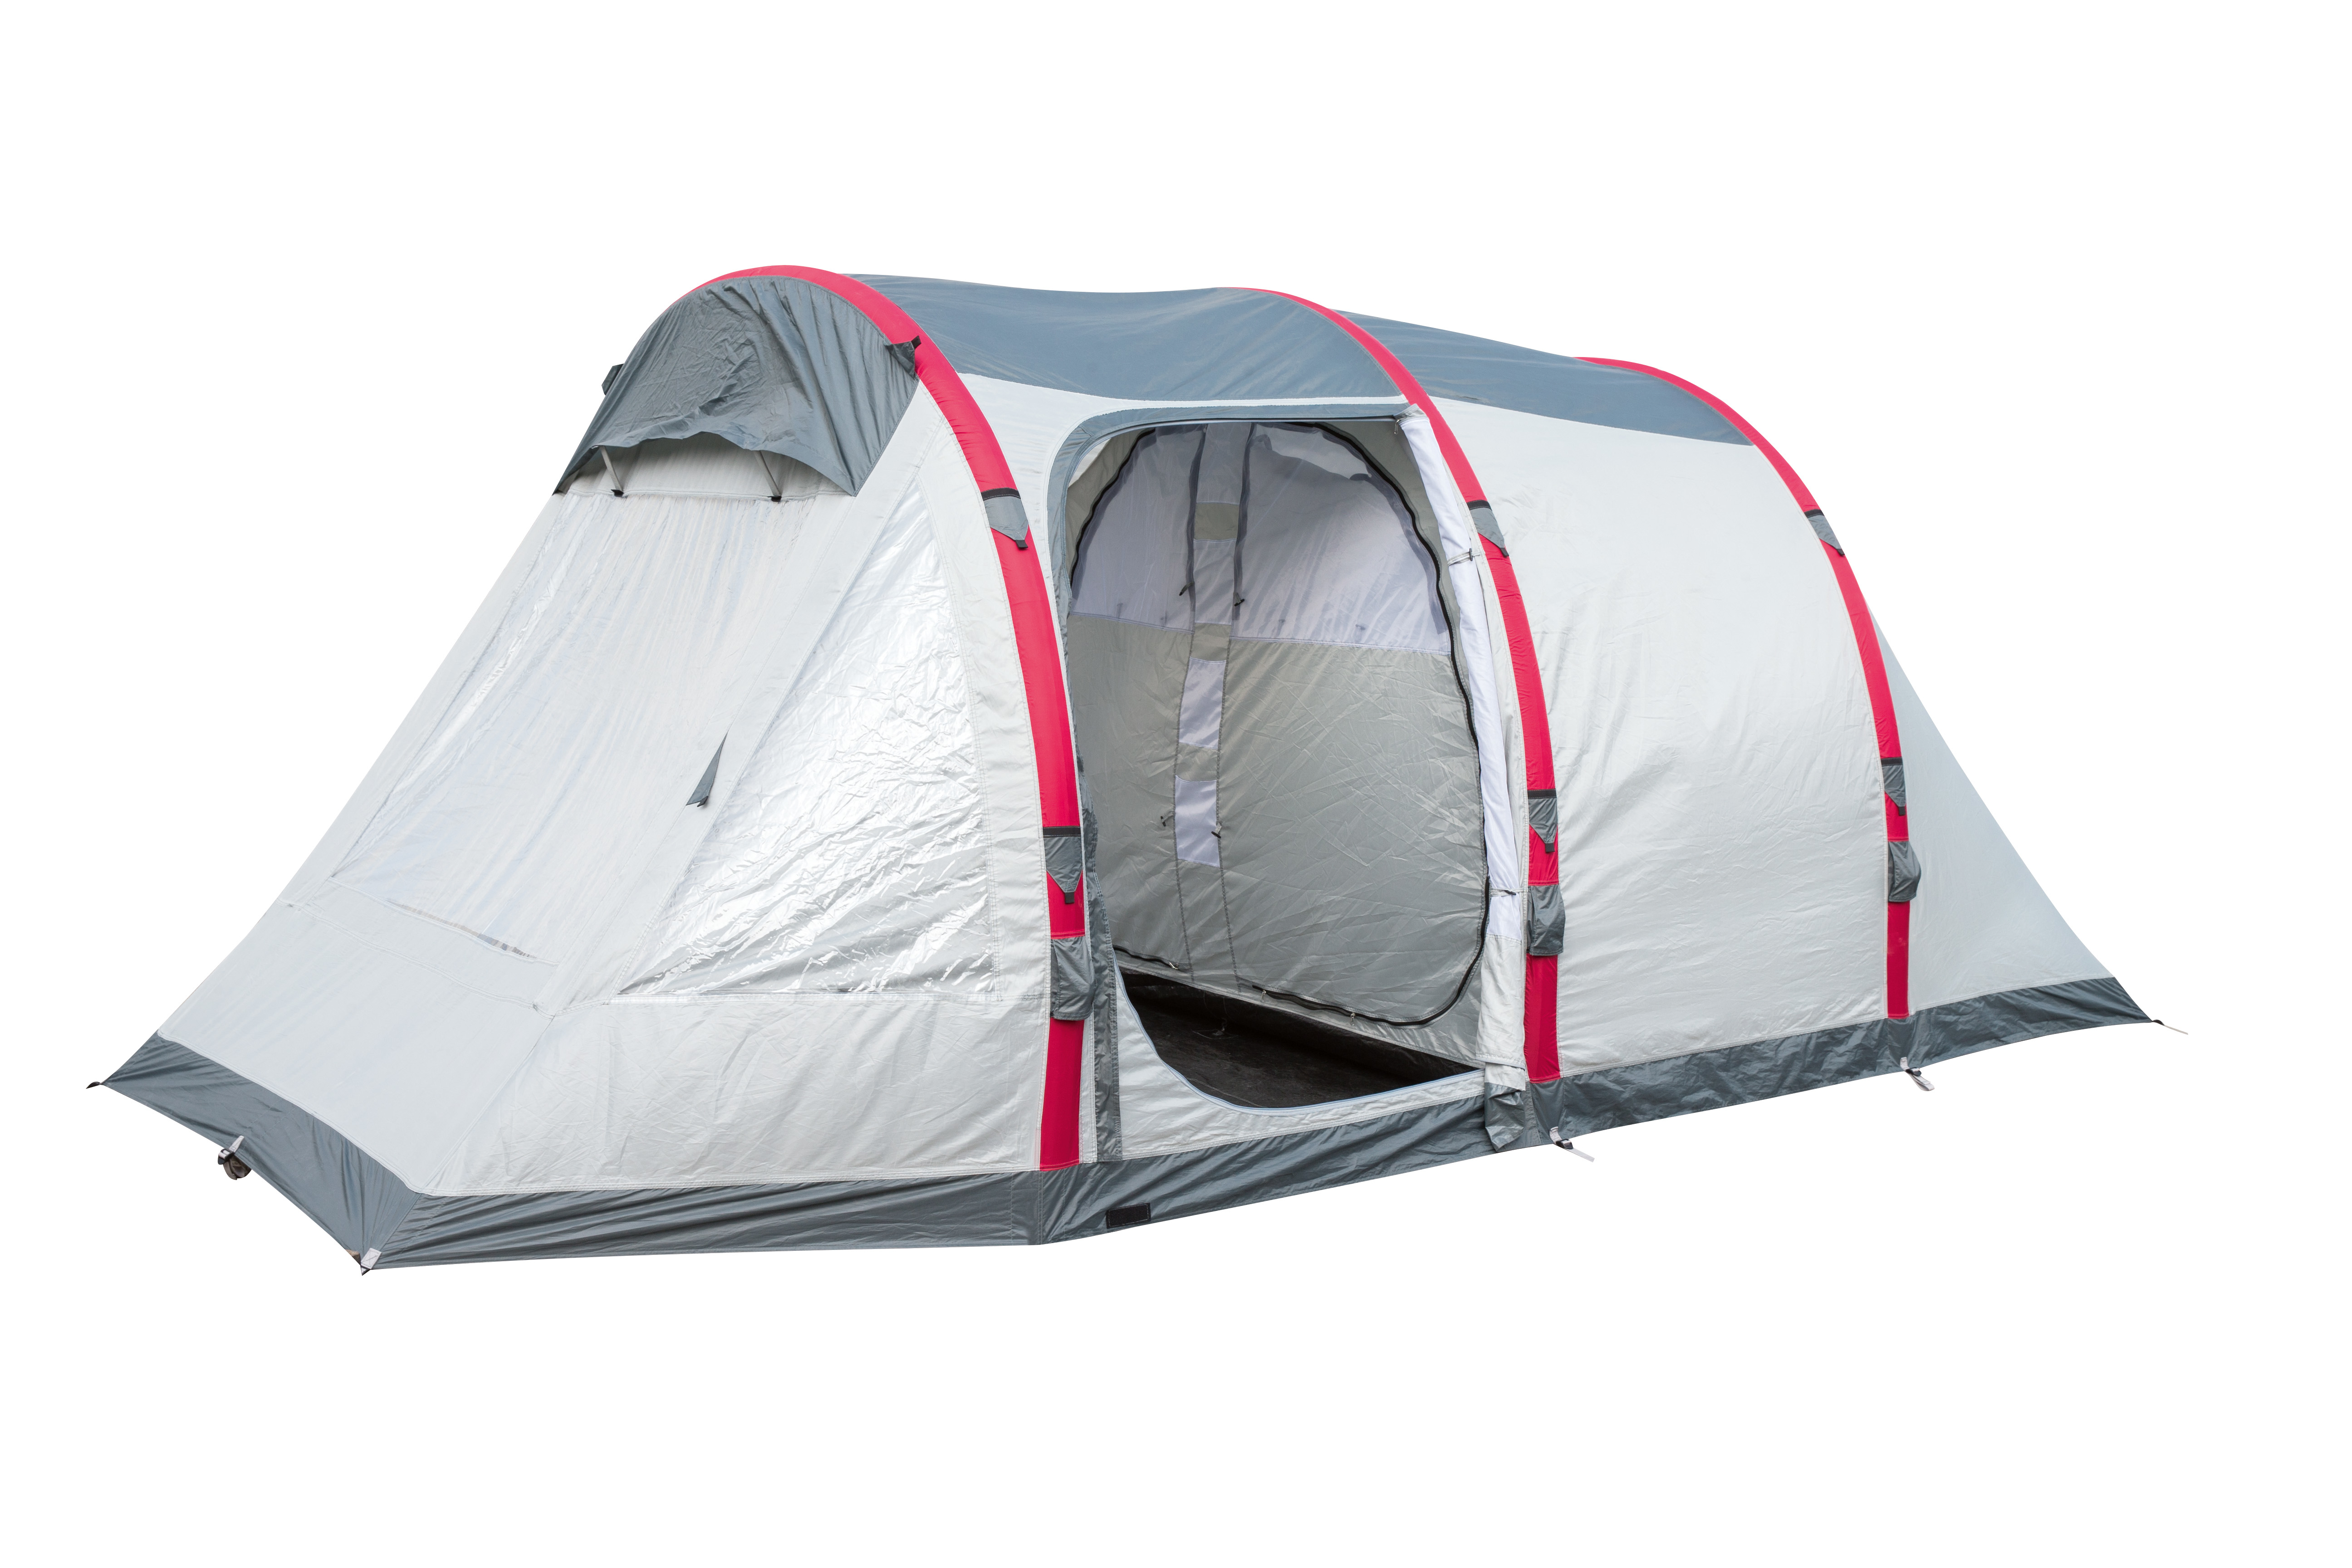 Bestway Sierra Ridge Air Pro X4 Tent - 4 personen